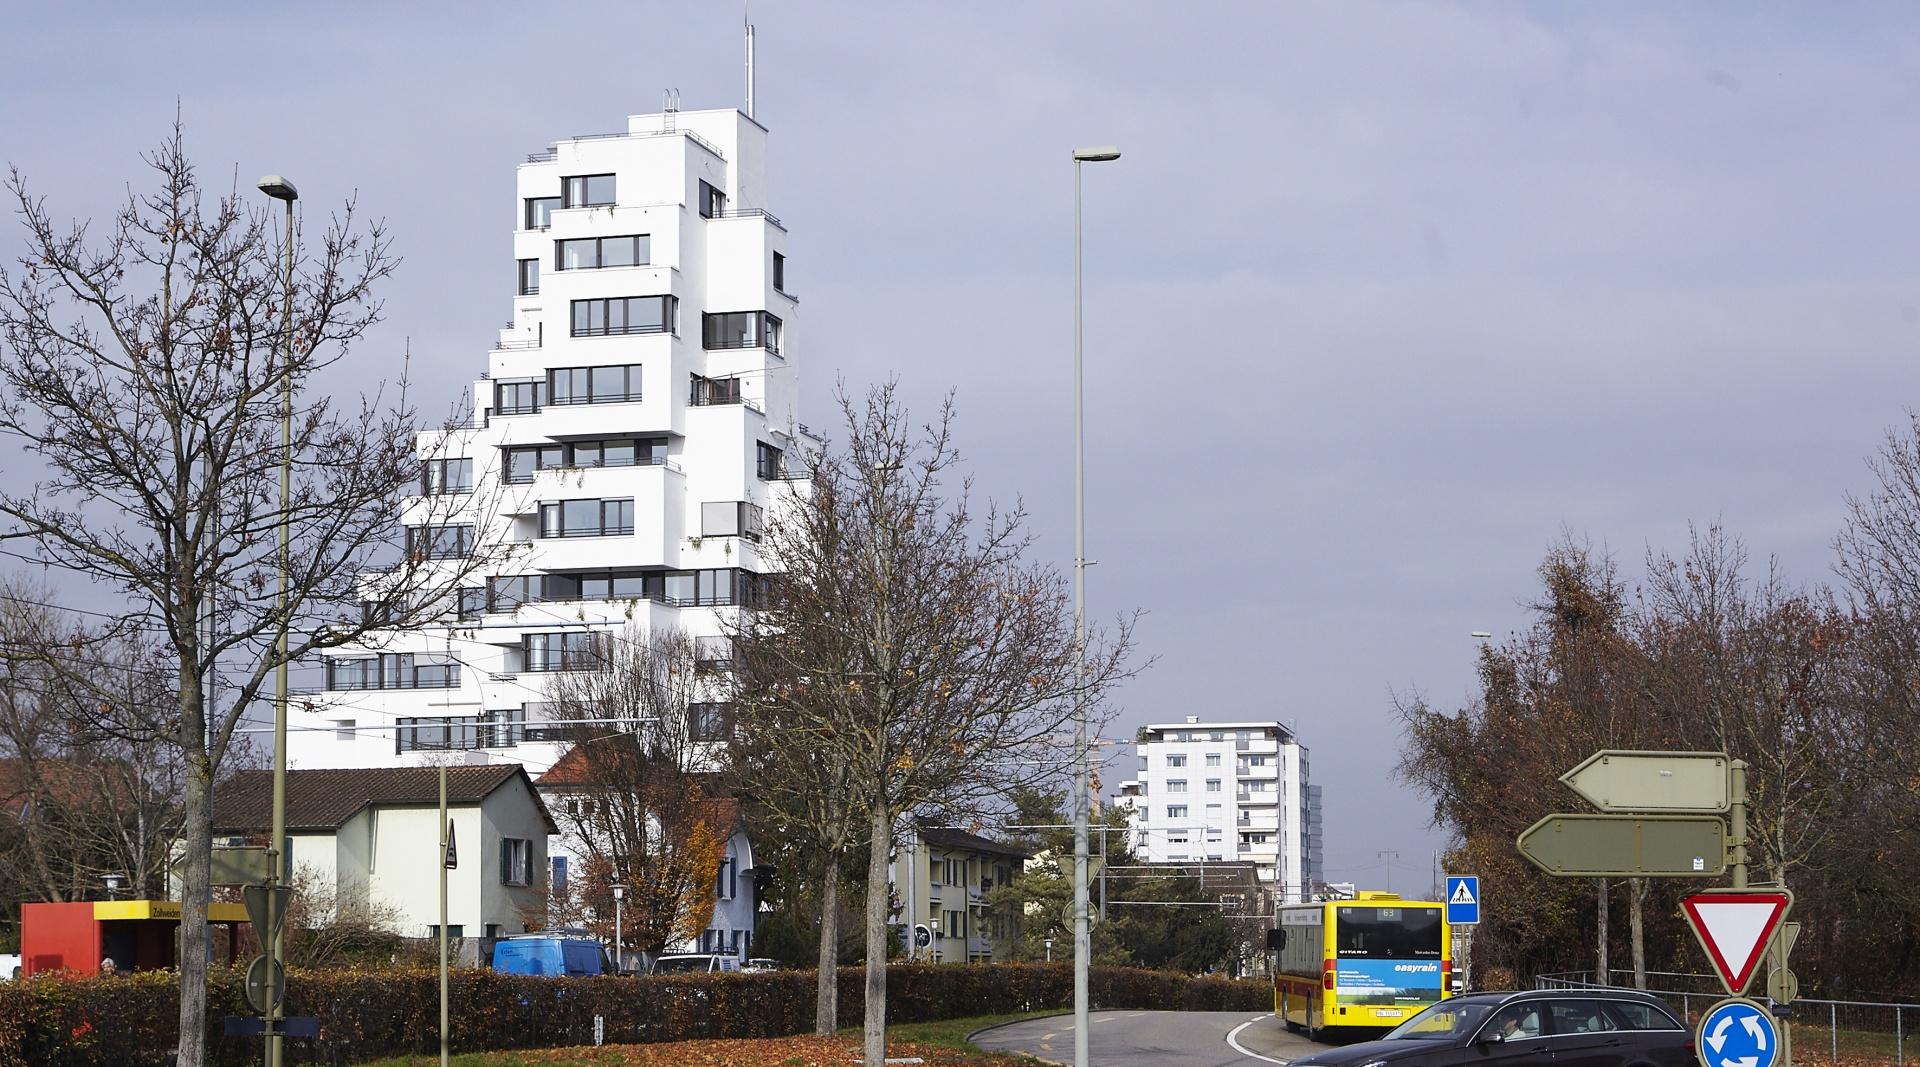 Stollturm_Kreisel_Zollweiden  © Architektur Rolf Stalder AG / Maria Gambino